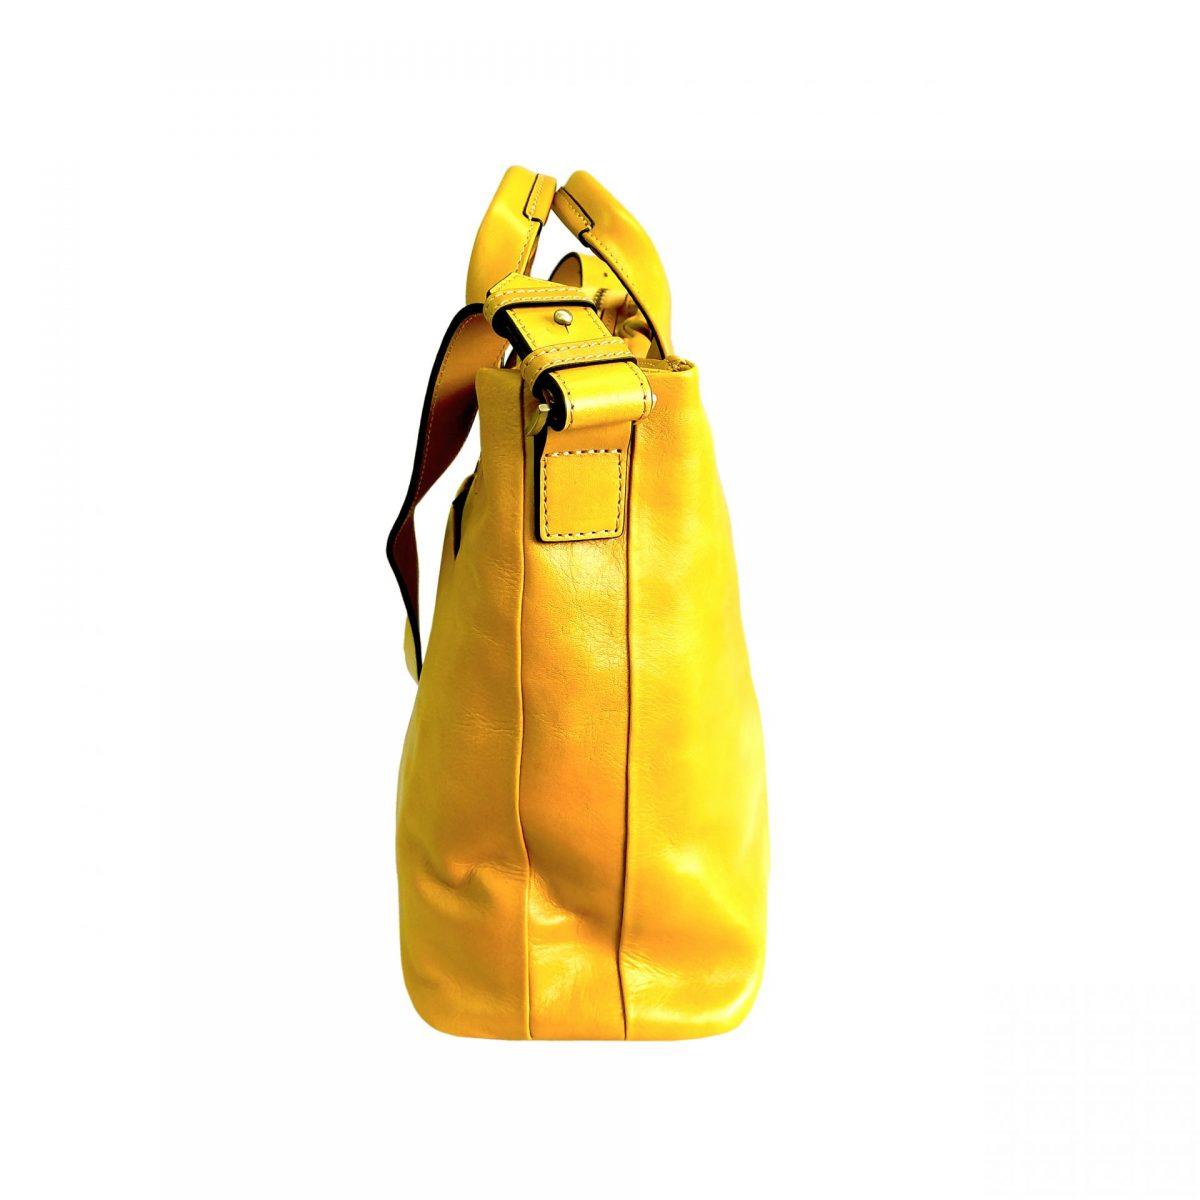 corteo centro giallo | caedekyoto